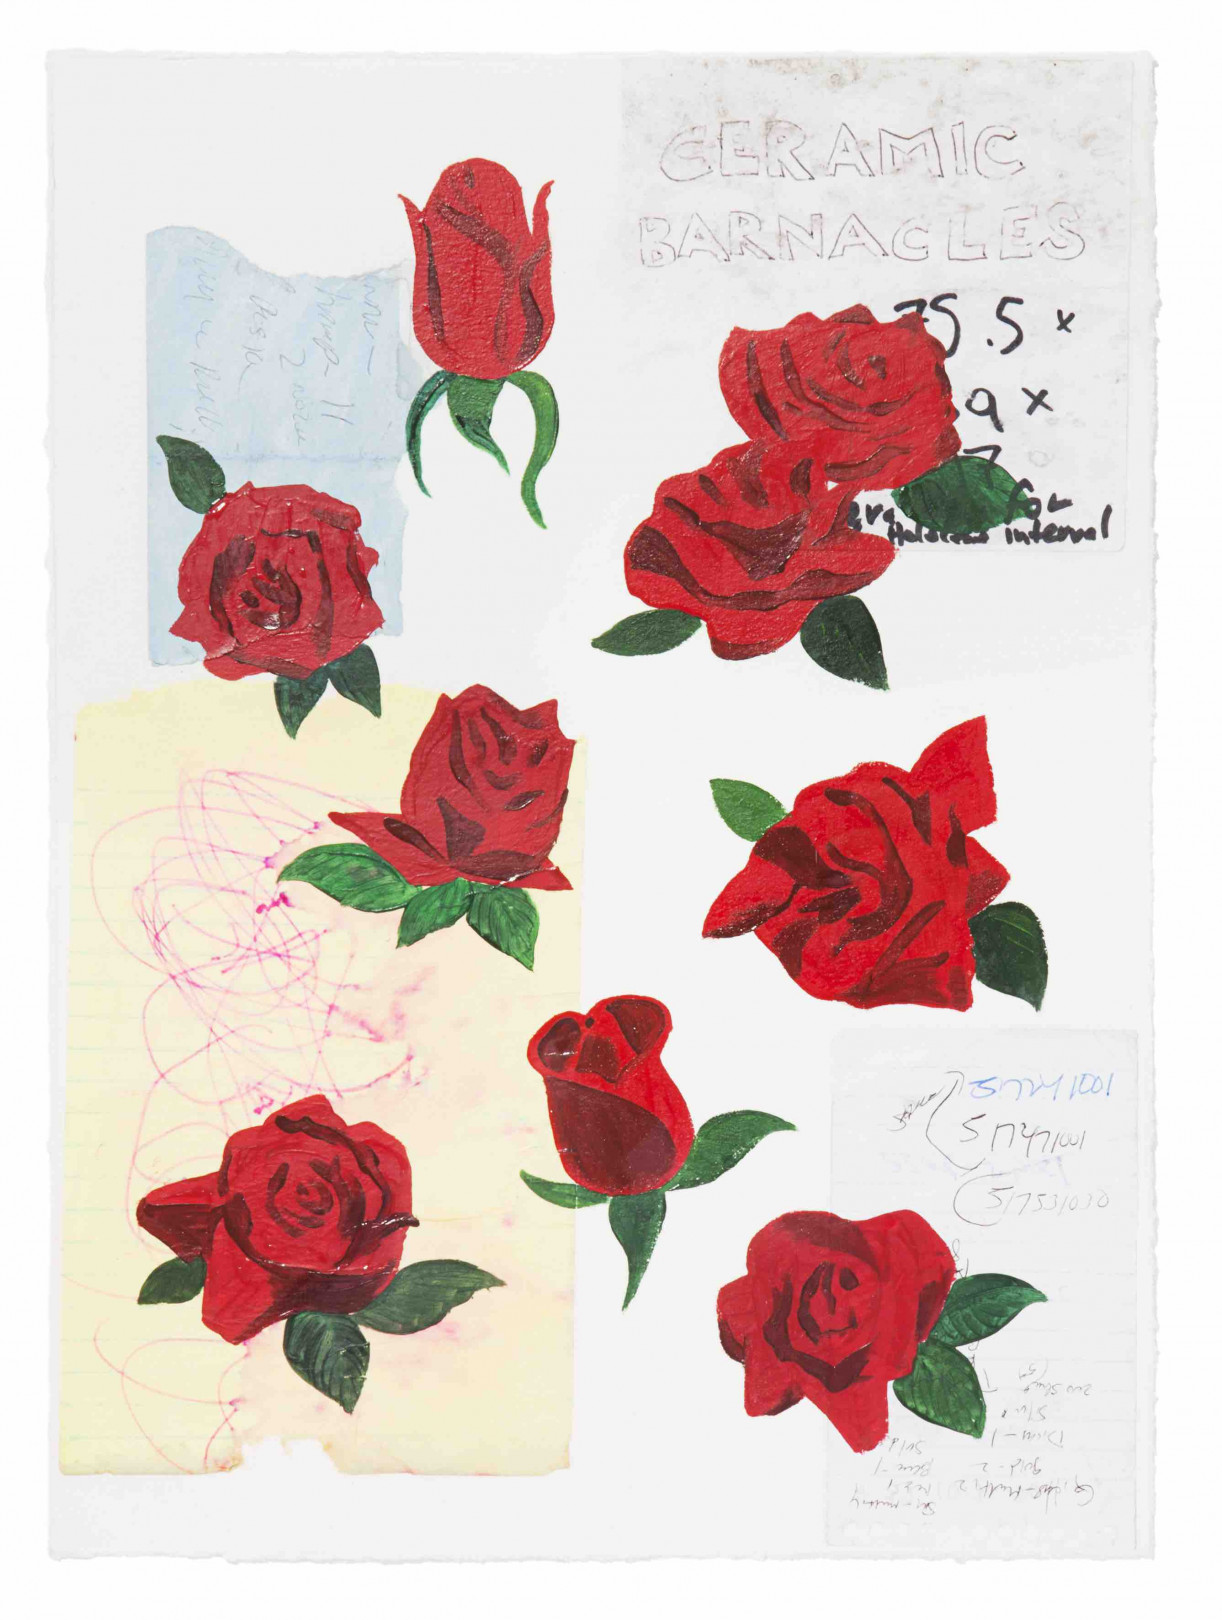 KOJI YAMAGUCHIの個展「ROSES」、SALT AND PEPPERと代官山蔦屋で同時開催